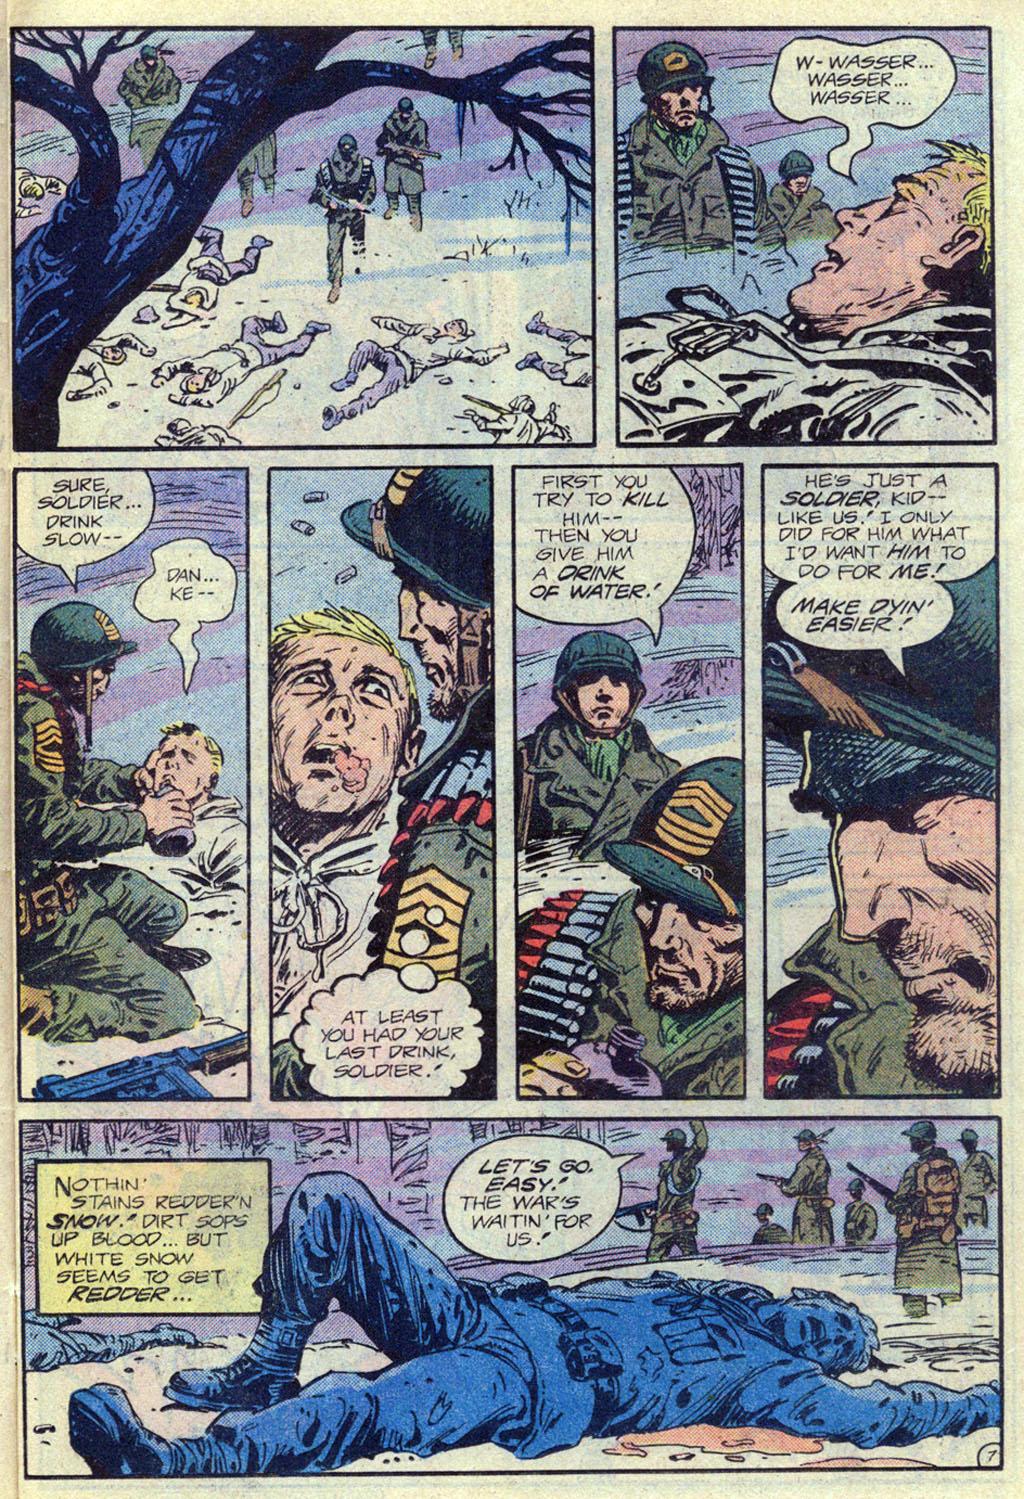 Read online Sgt. Rock comic -  Issue #369 - 7